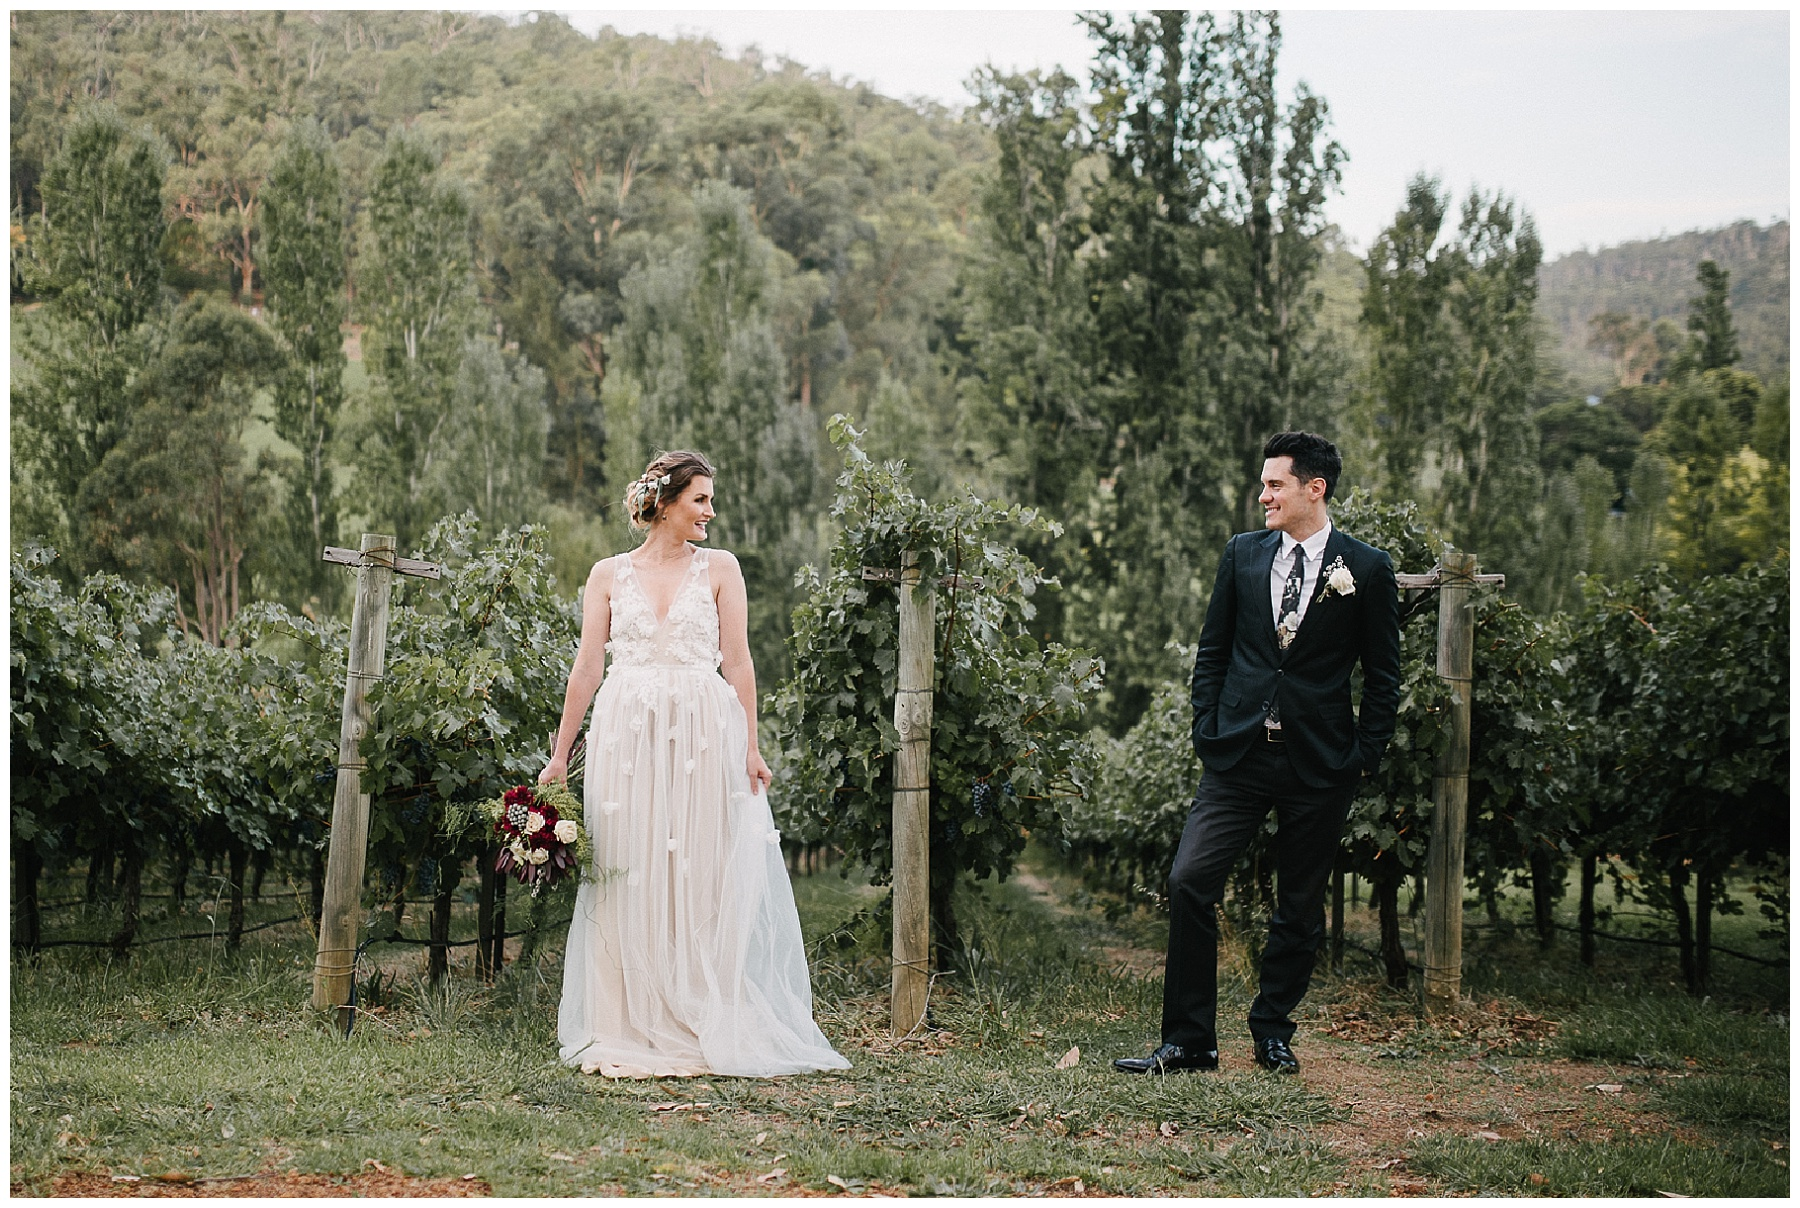 perth-wedding-photographer-brookside-vineyard (30).jpg